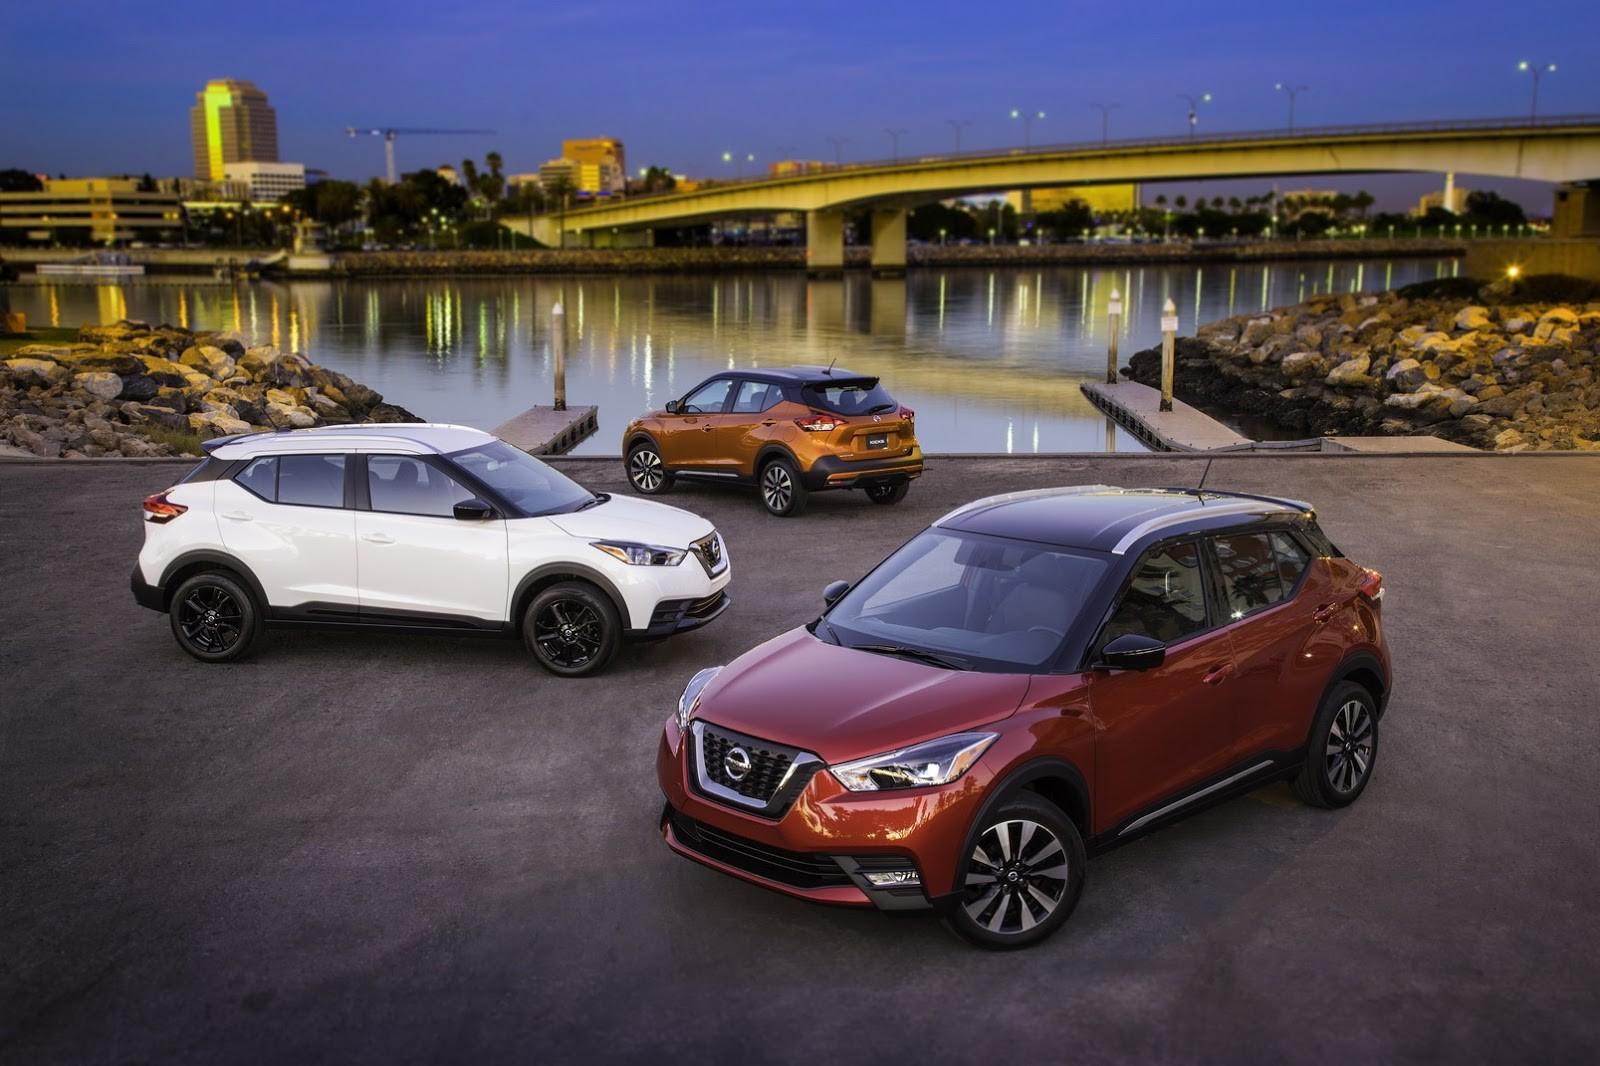 2018 Nissan Kicks (EE.UU)